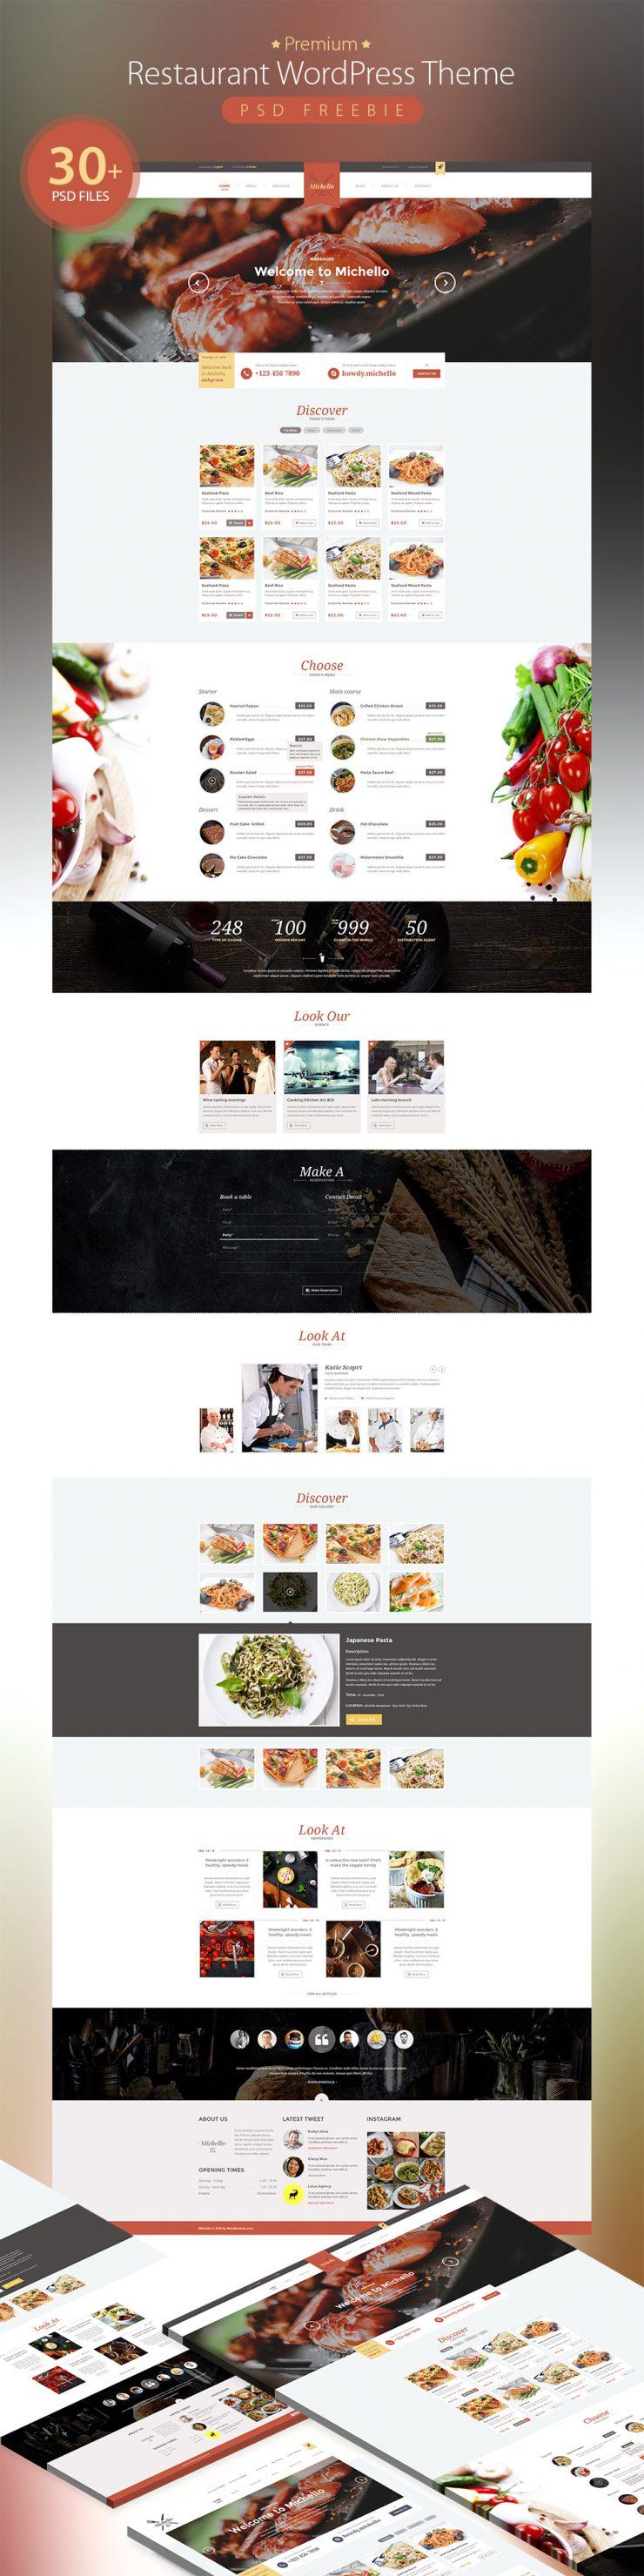 Premium Restaurant WordPress Theme PSD Freebie